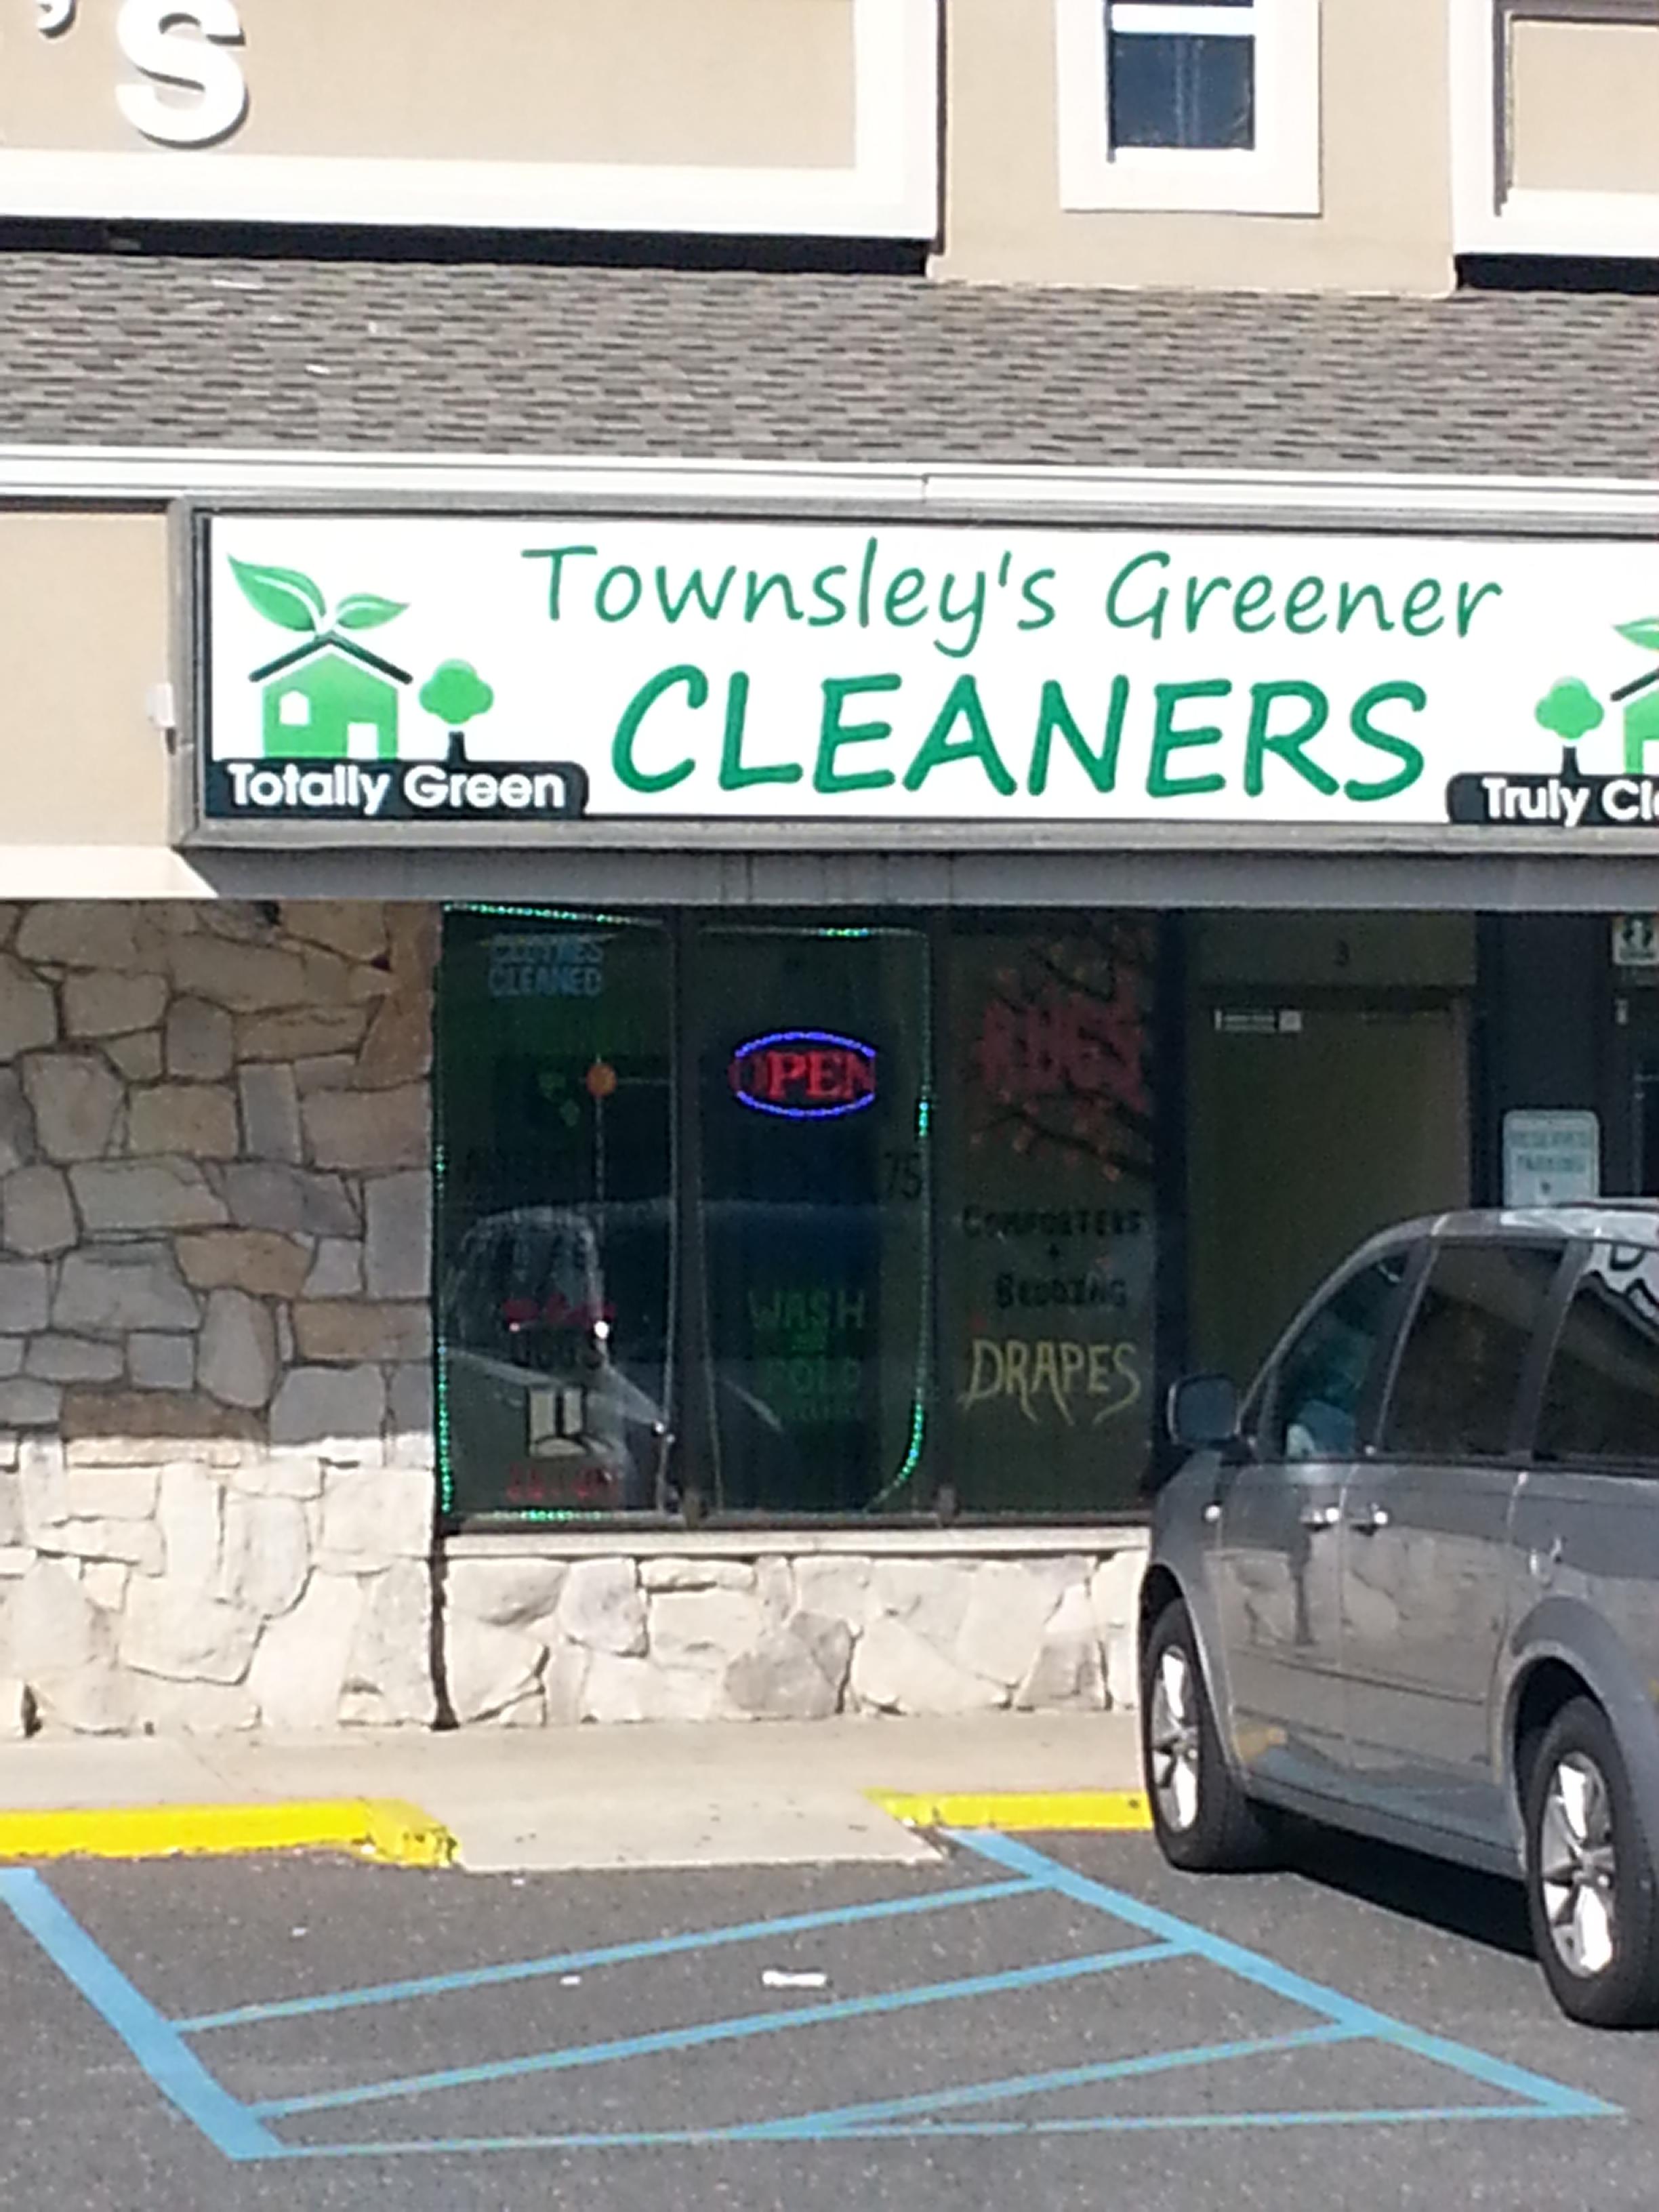 Townsley Greener Cleaners Now Open in Barnegat